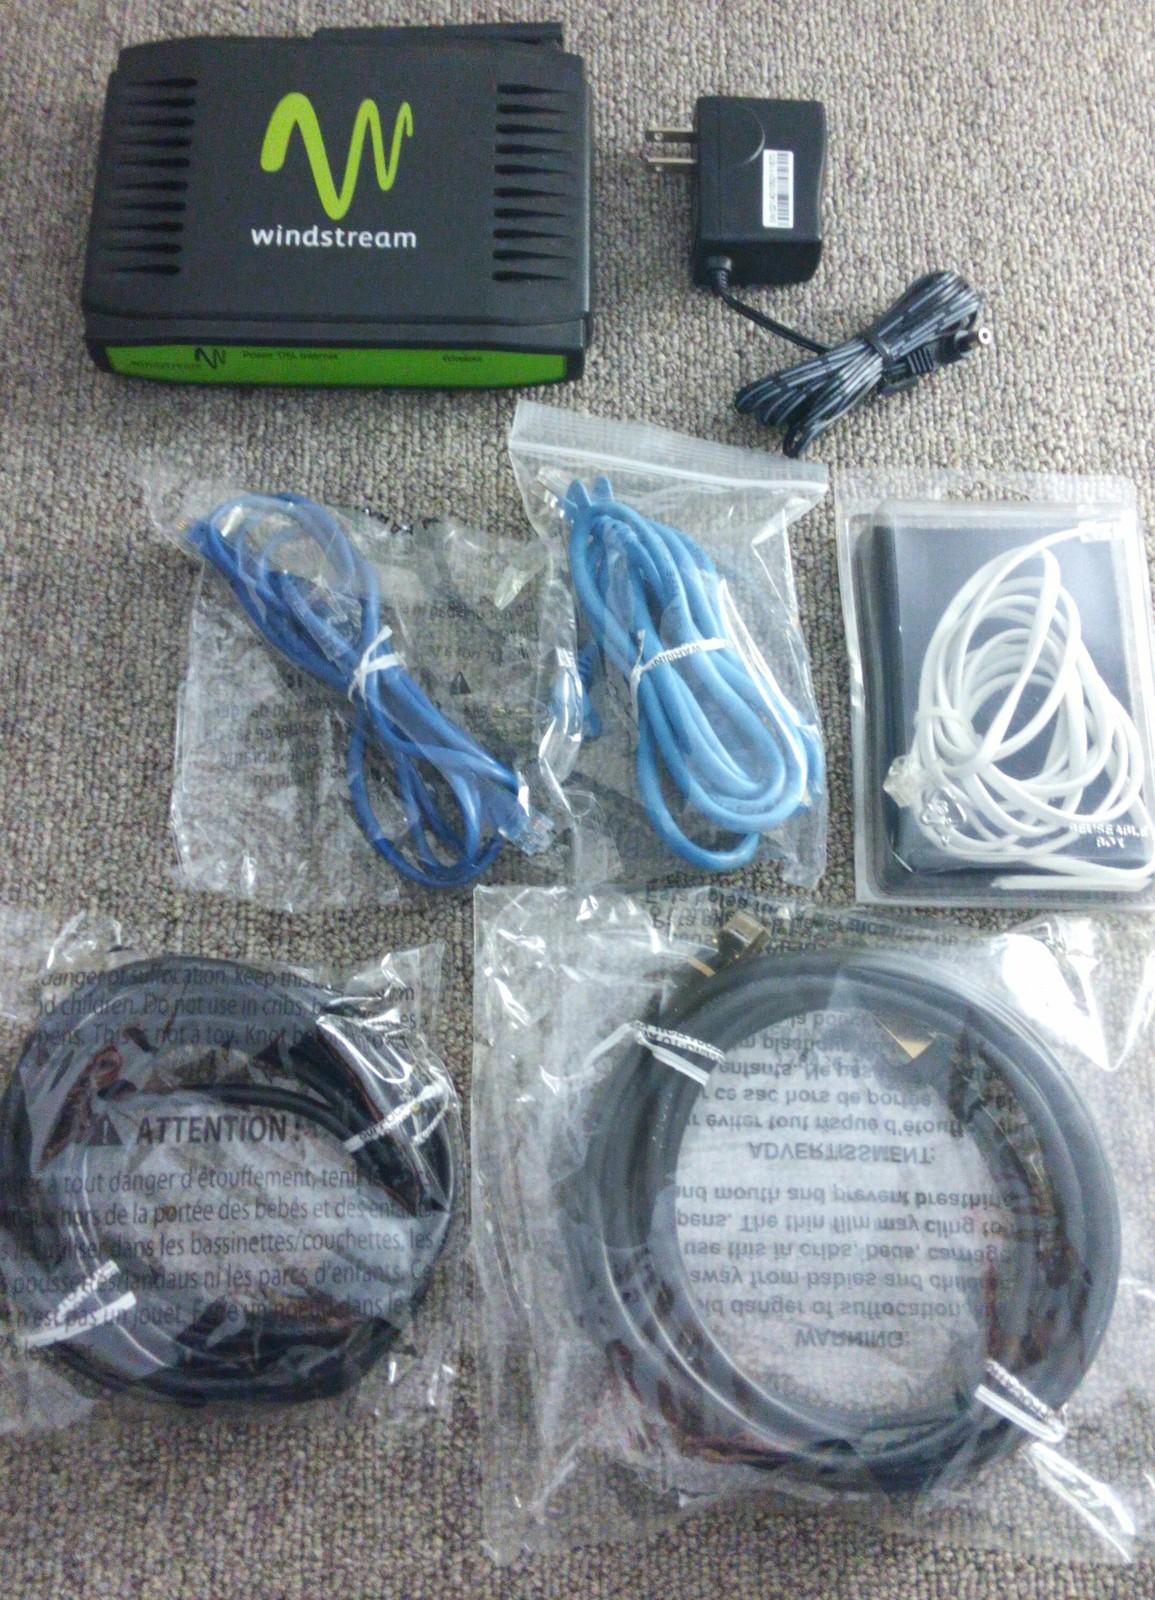 Windstream Sagemcom Modem Router Fast 1704 and 50 similar items